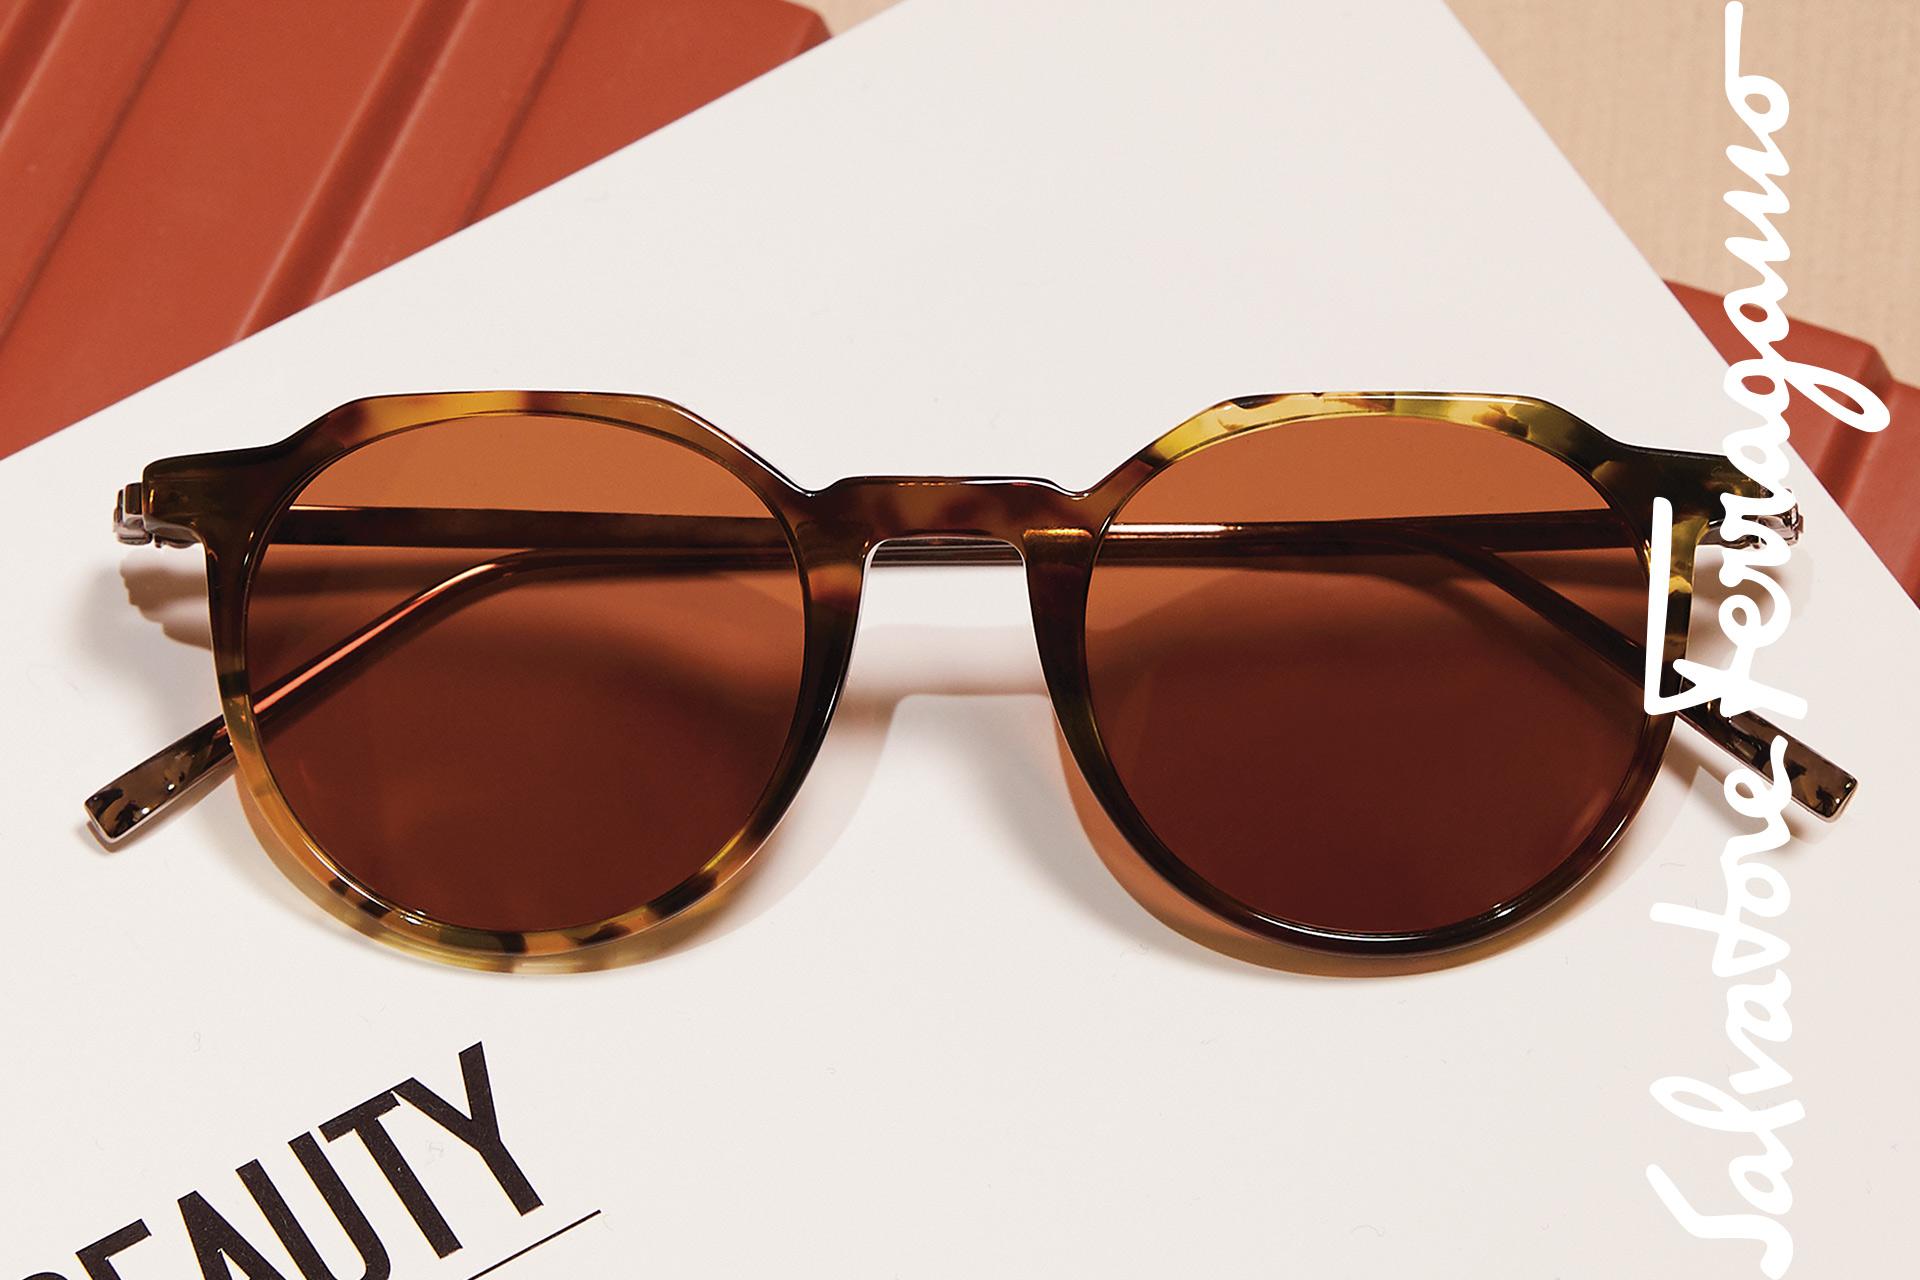 Salvatore Ferragamo newest Taroni sunglasses